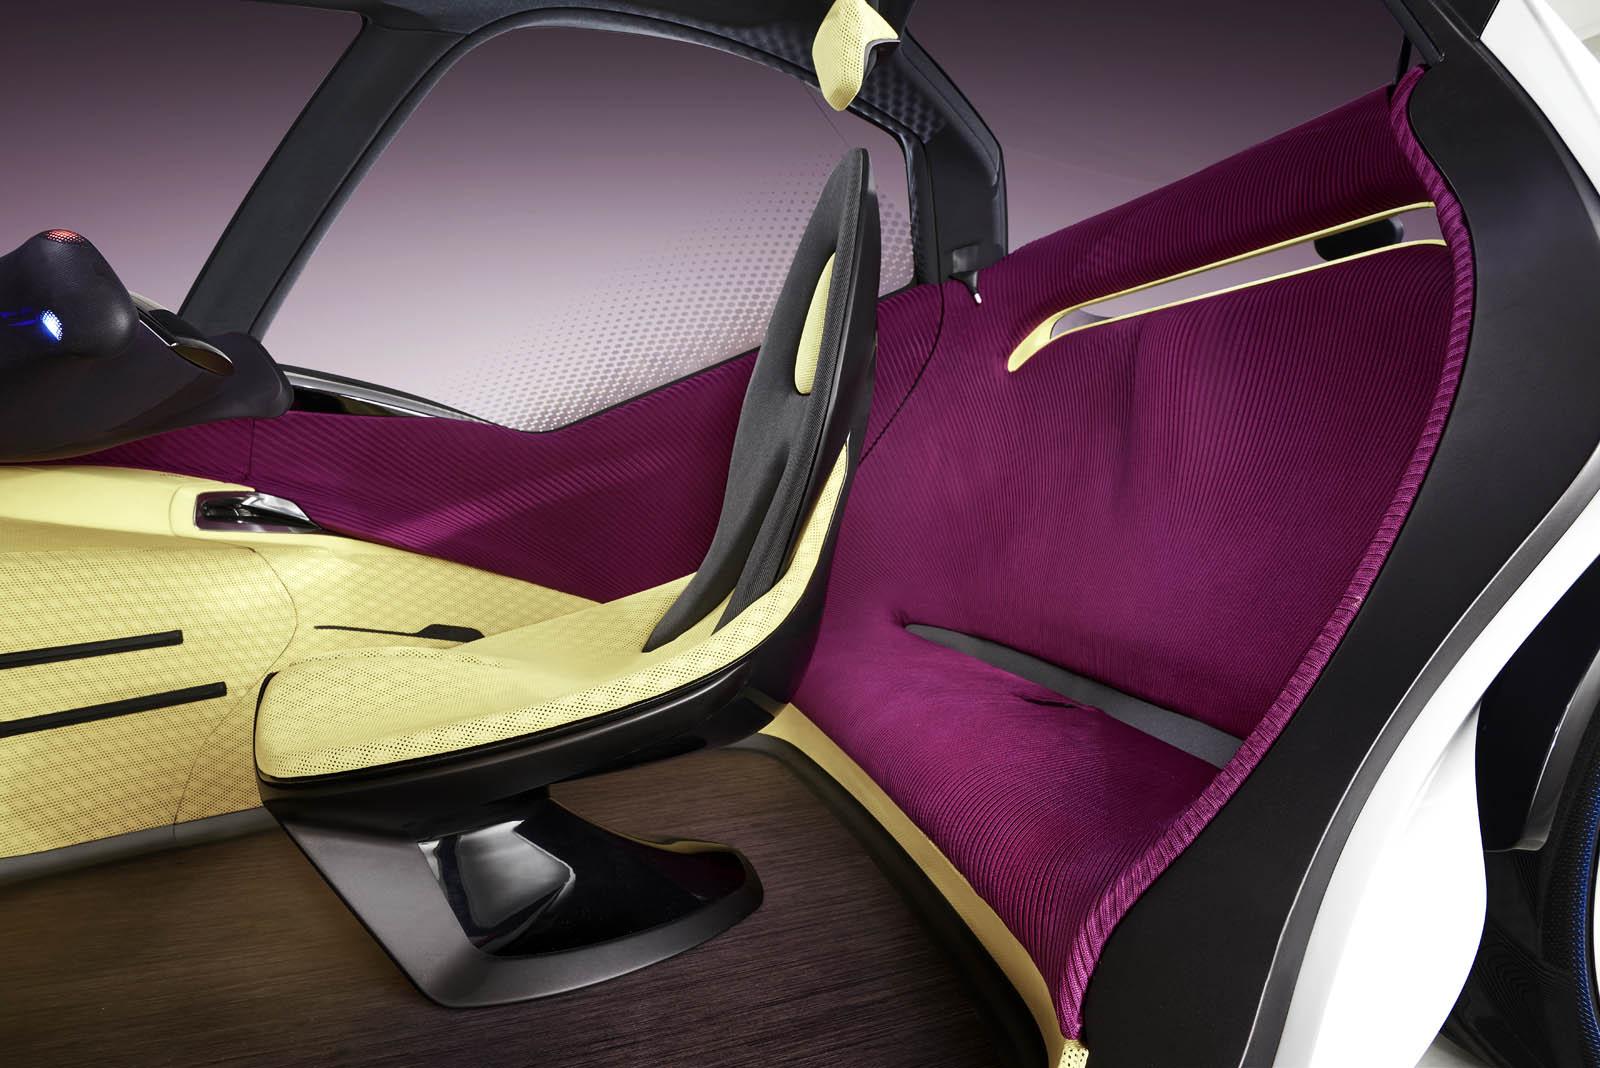 2017_Toyota_Concept_i-Tril_InteriorDet_01 copy